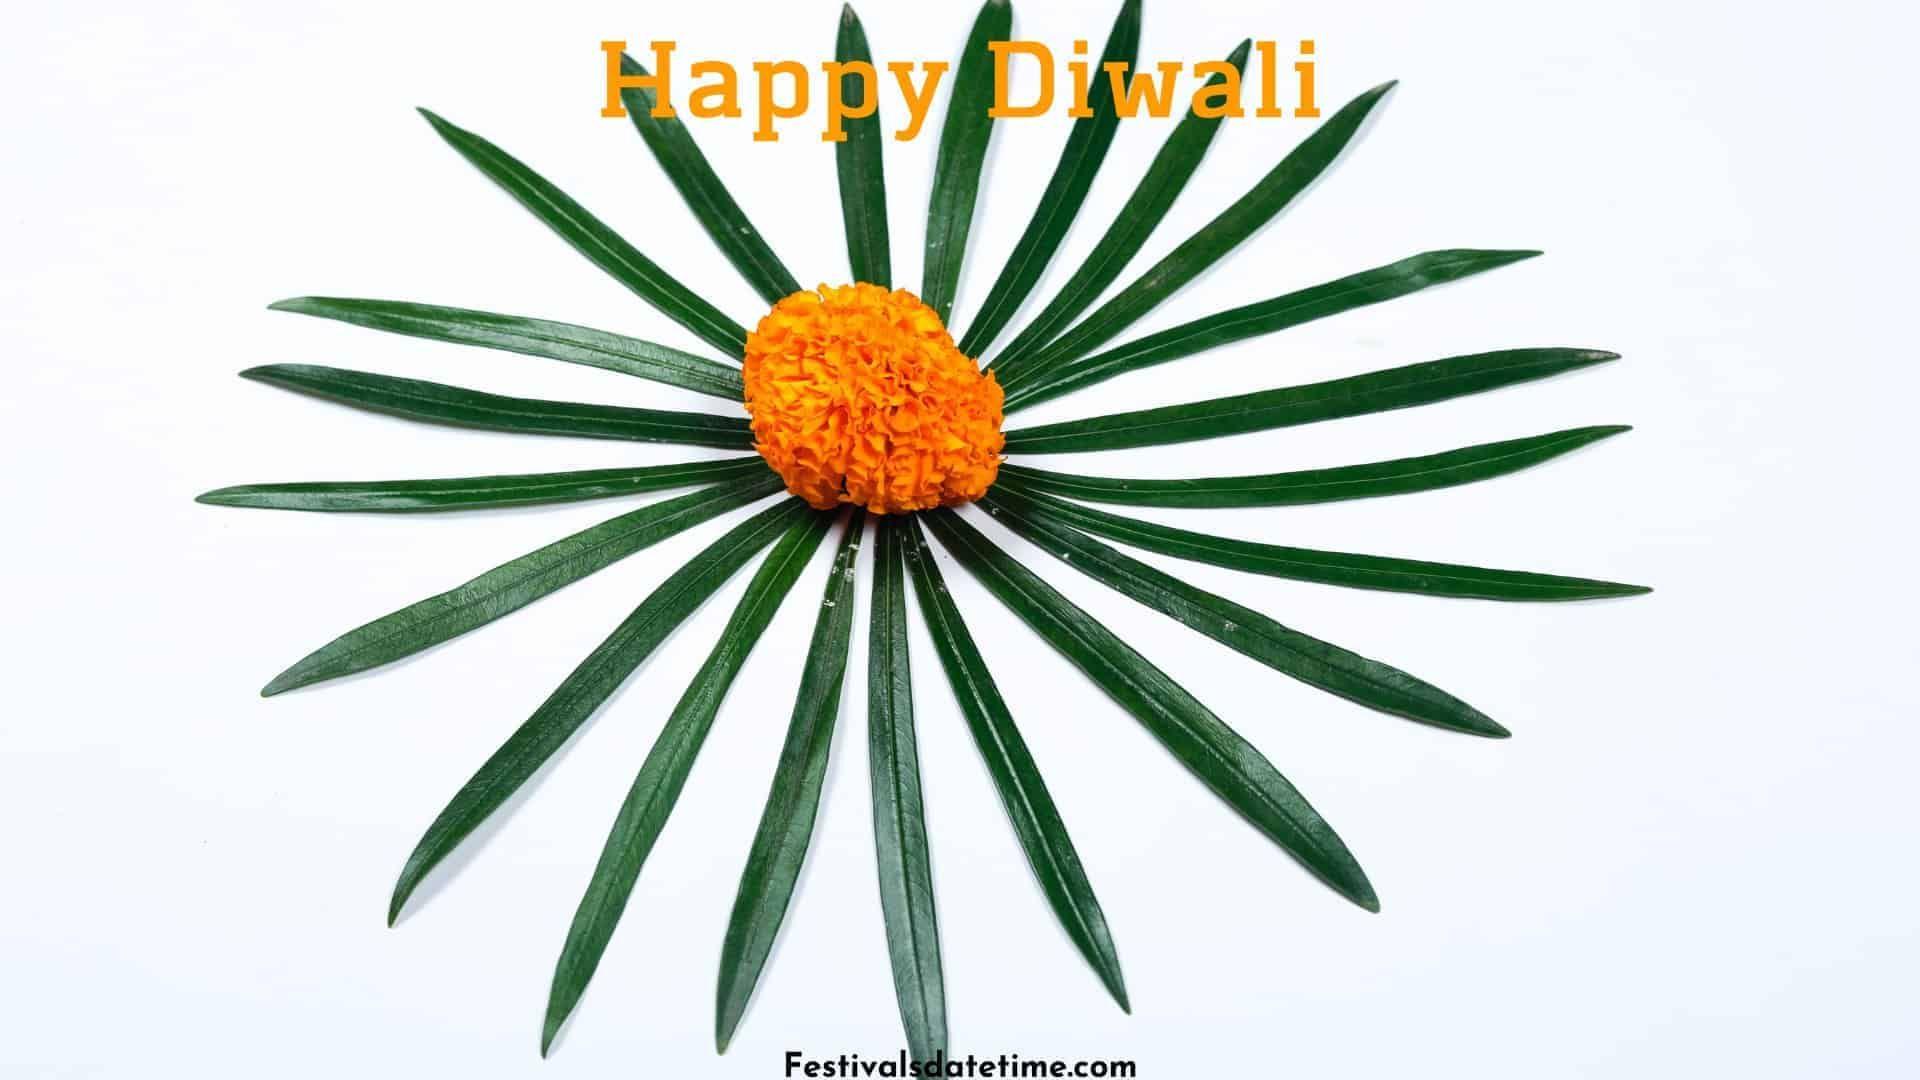 Diwali Rangoli 2020 in 2020 Rangoli designs, Diwali